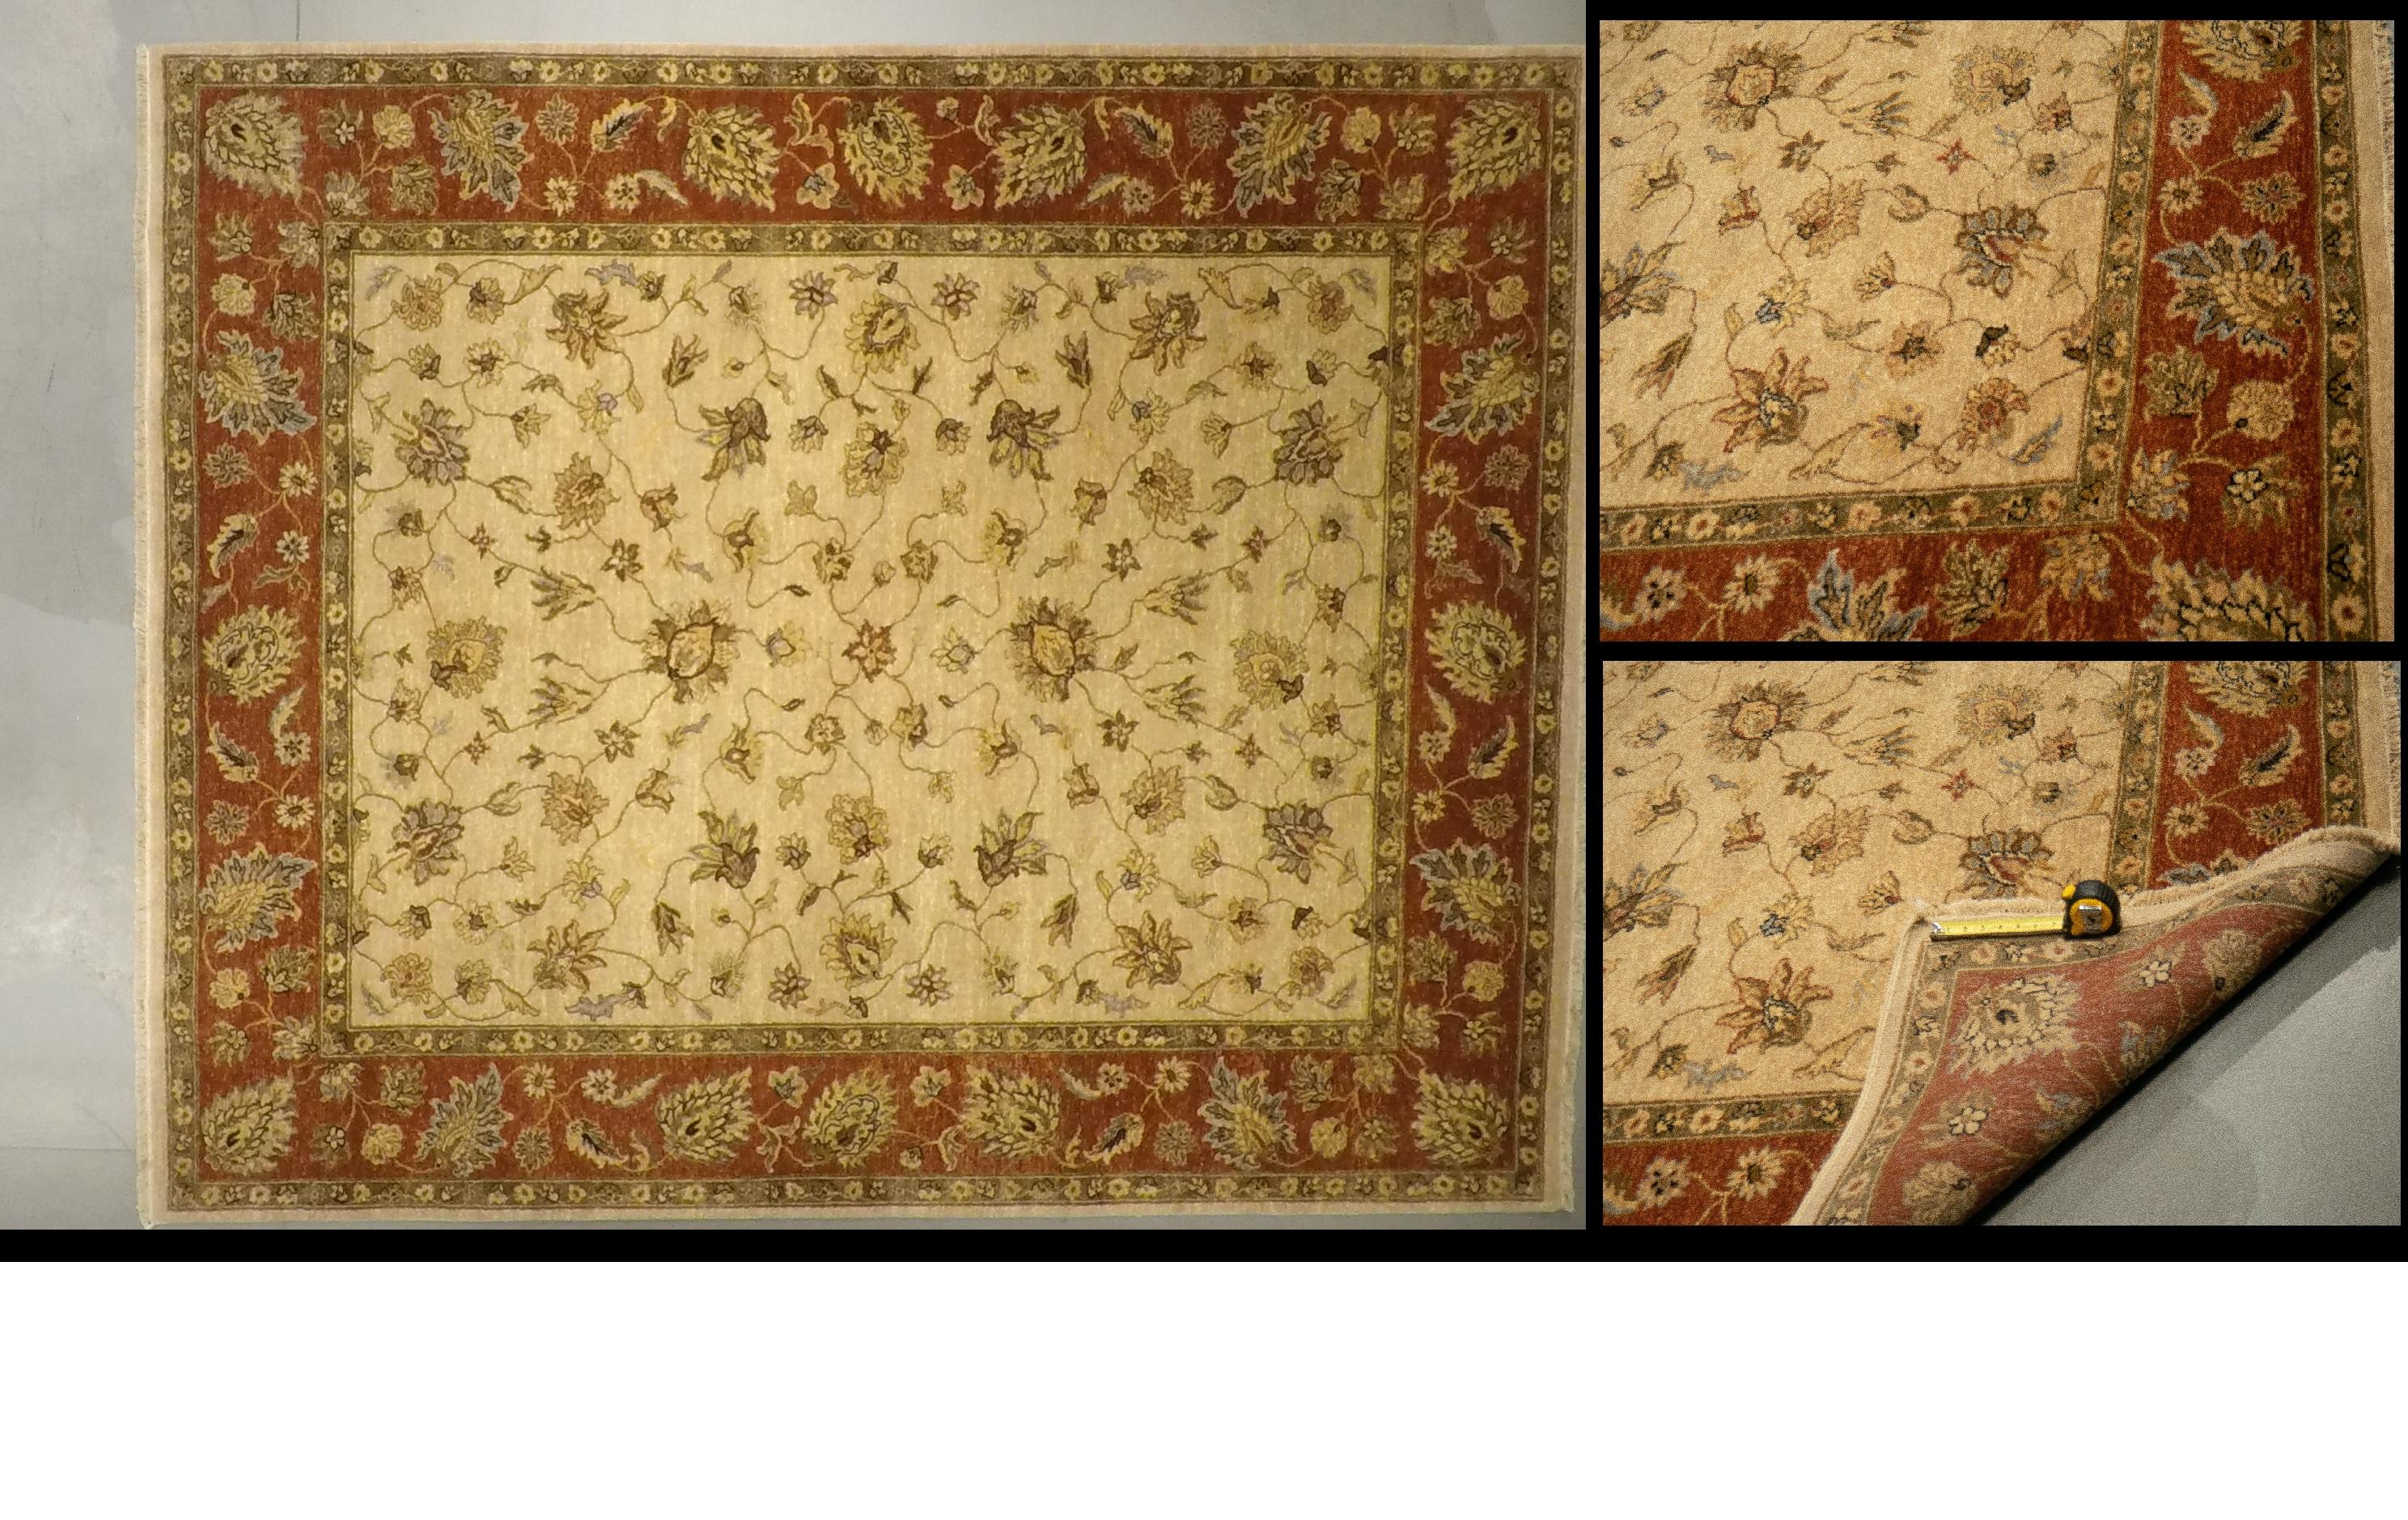 LD 58 3714 (7.10 x 9.6) Wool-Handmad